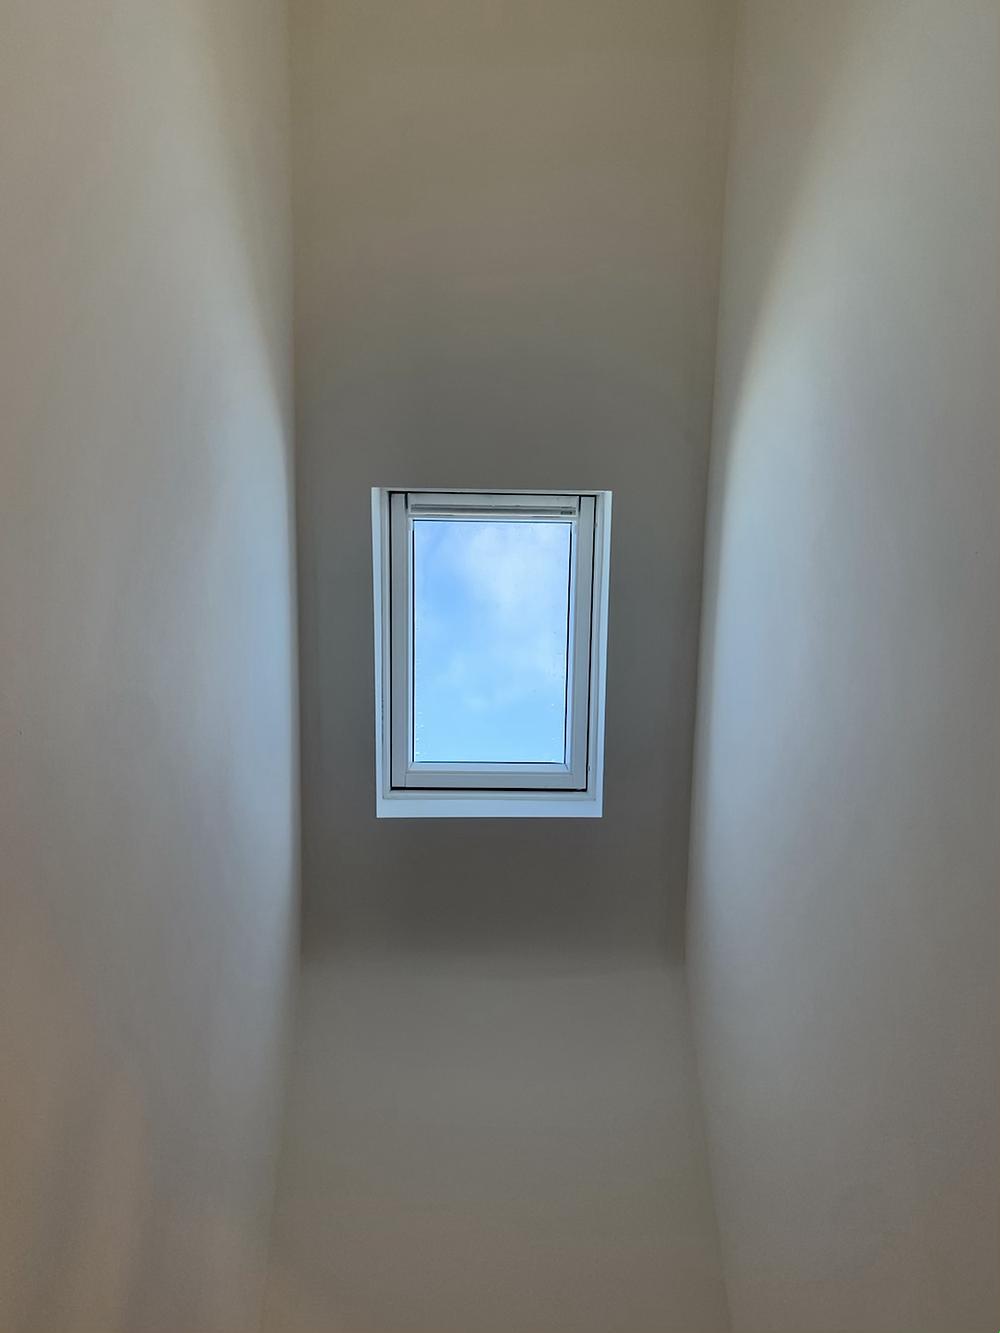 Dormer loft conversion Cricklewood NW2 London Velux